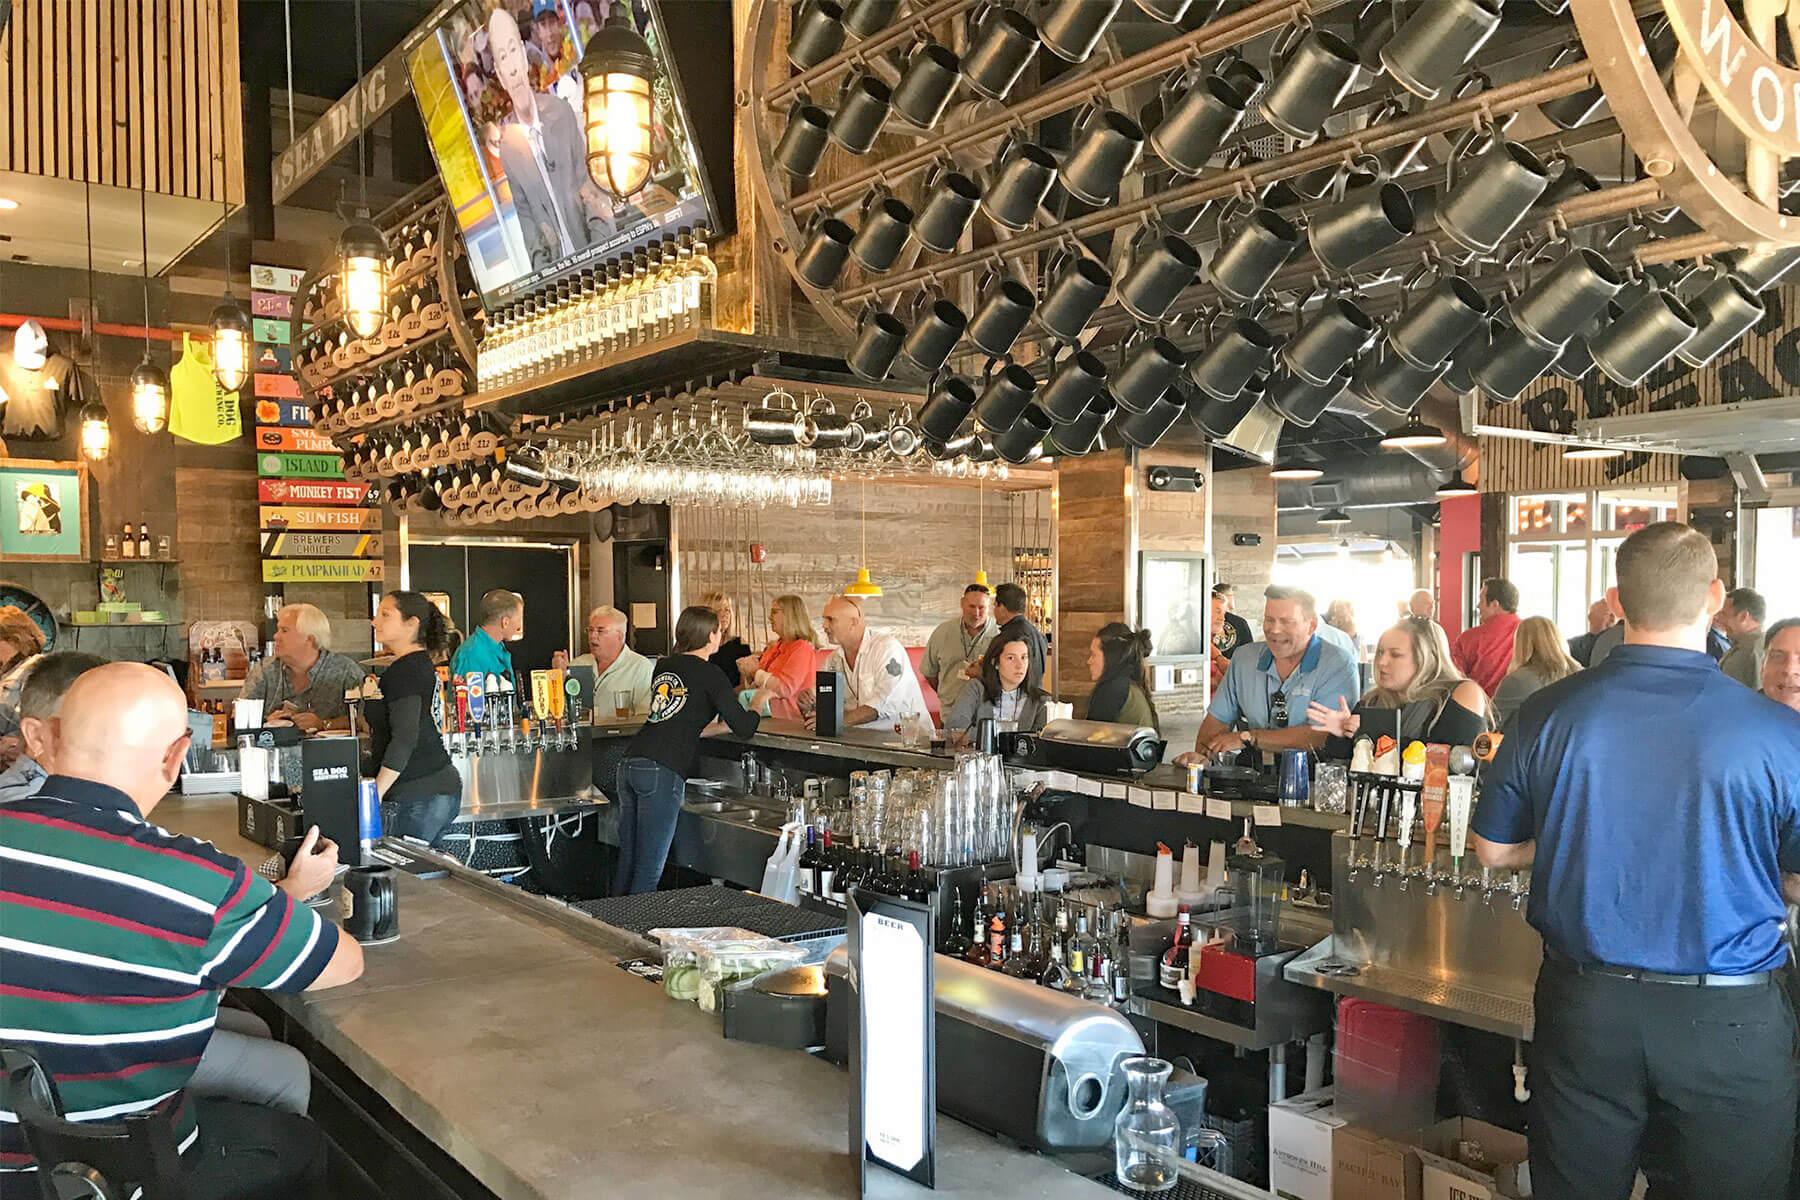 Inside the brewpub at Sea Dog Brewing Co. in Treasure, Island, Florida